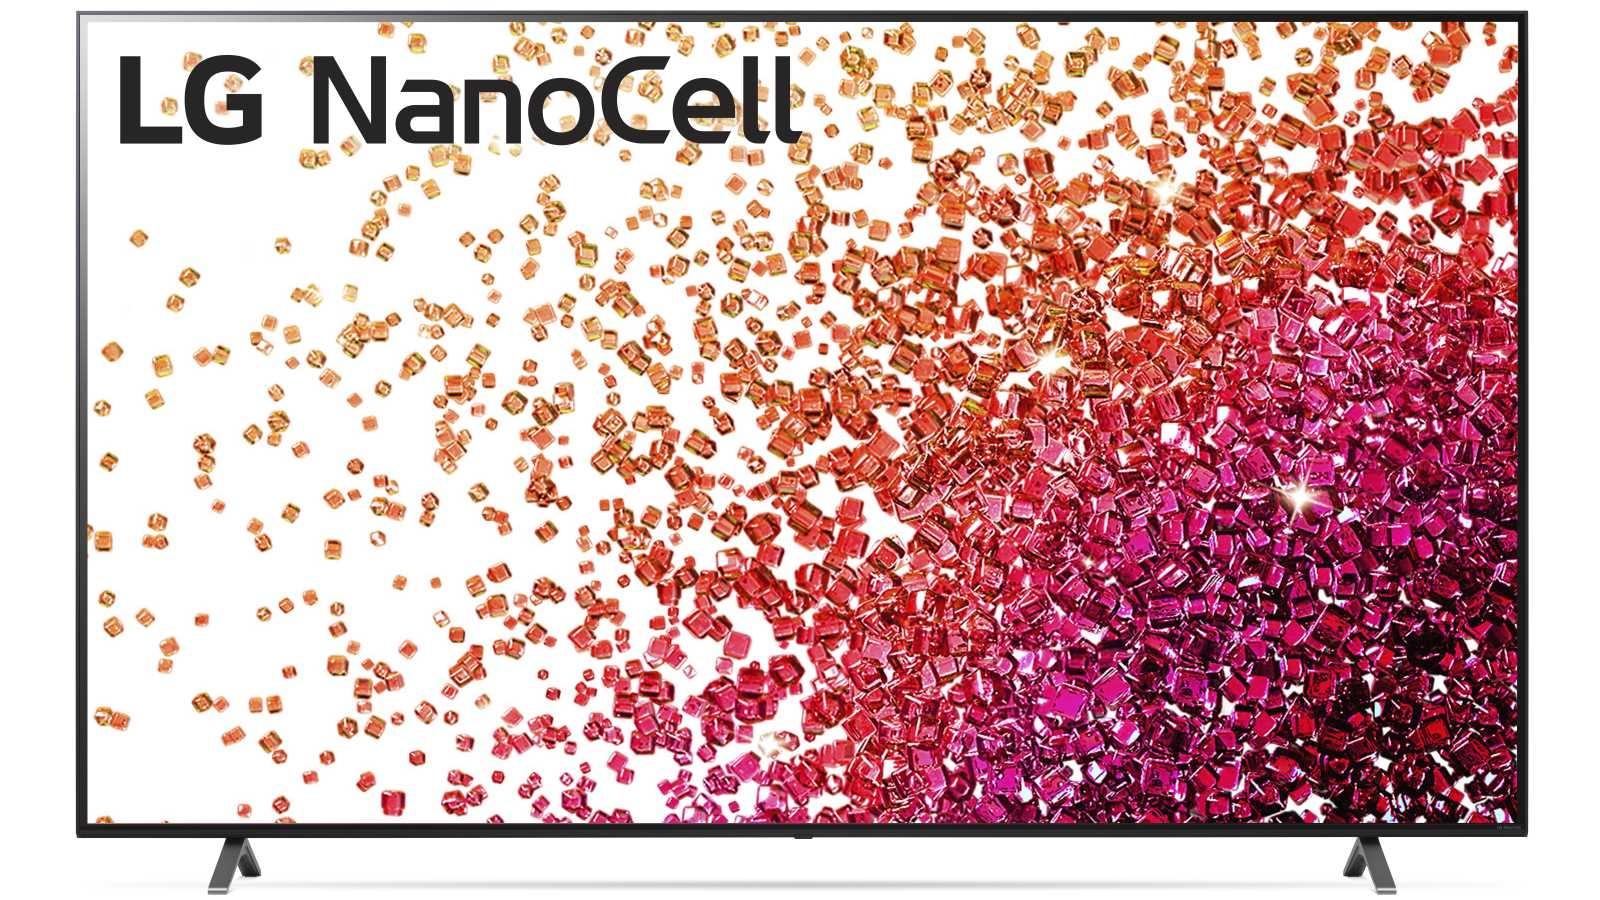 Image of LG 86-inch Nano75 4K UHD NanoCell LED LCD Ai ThinQ Smart TV